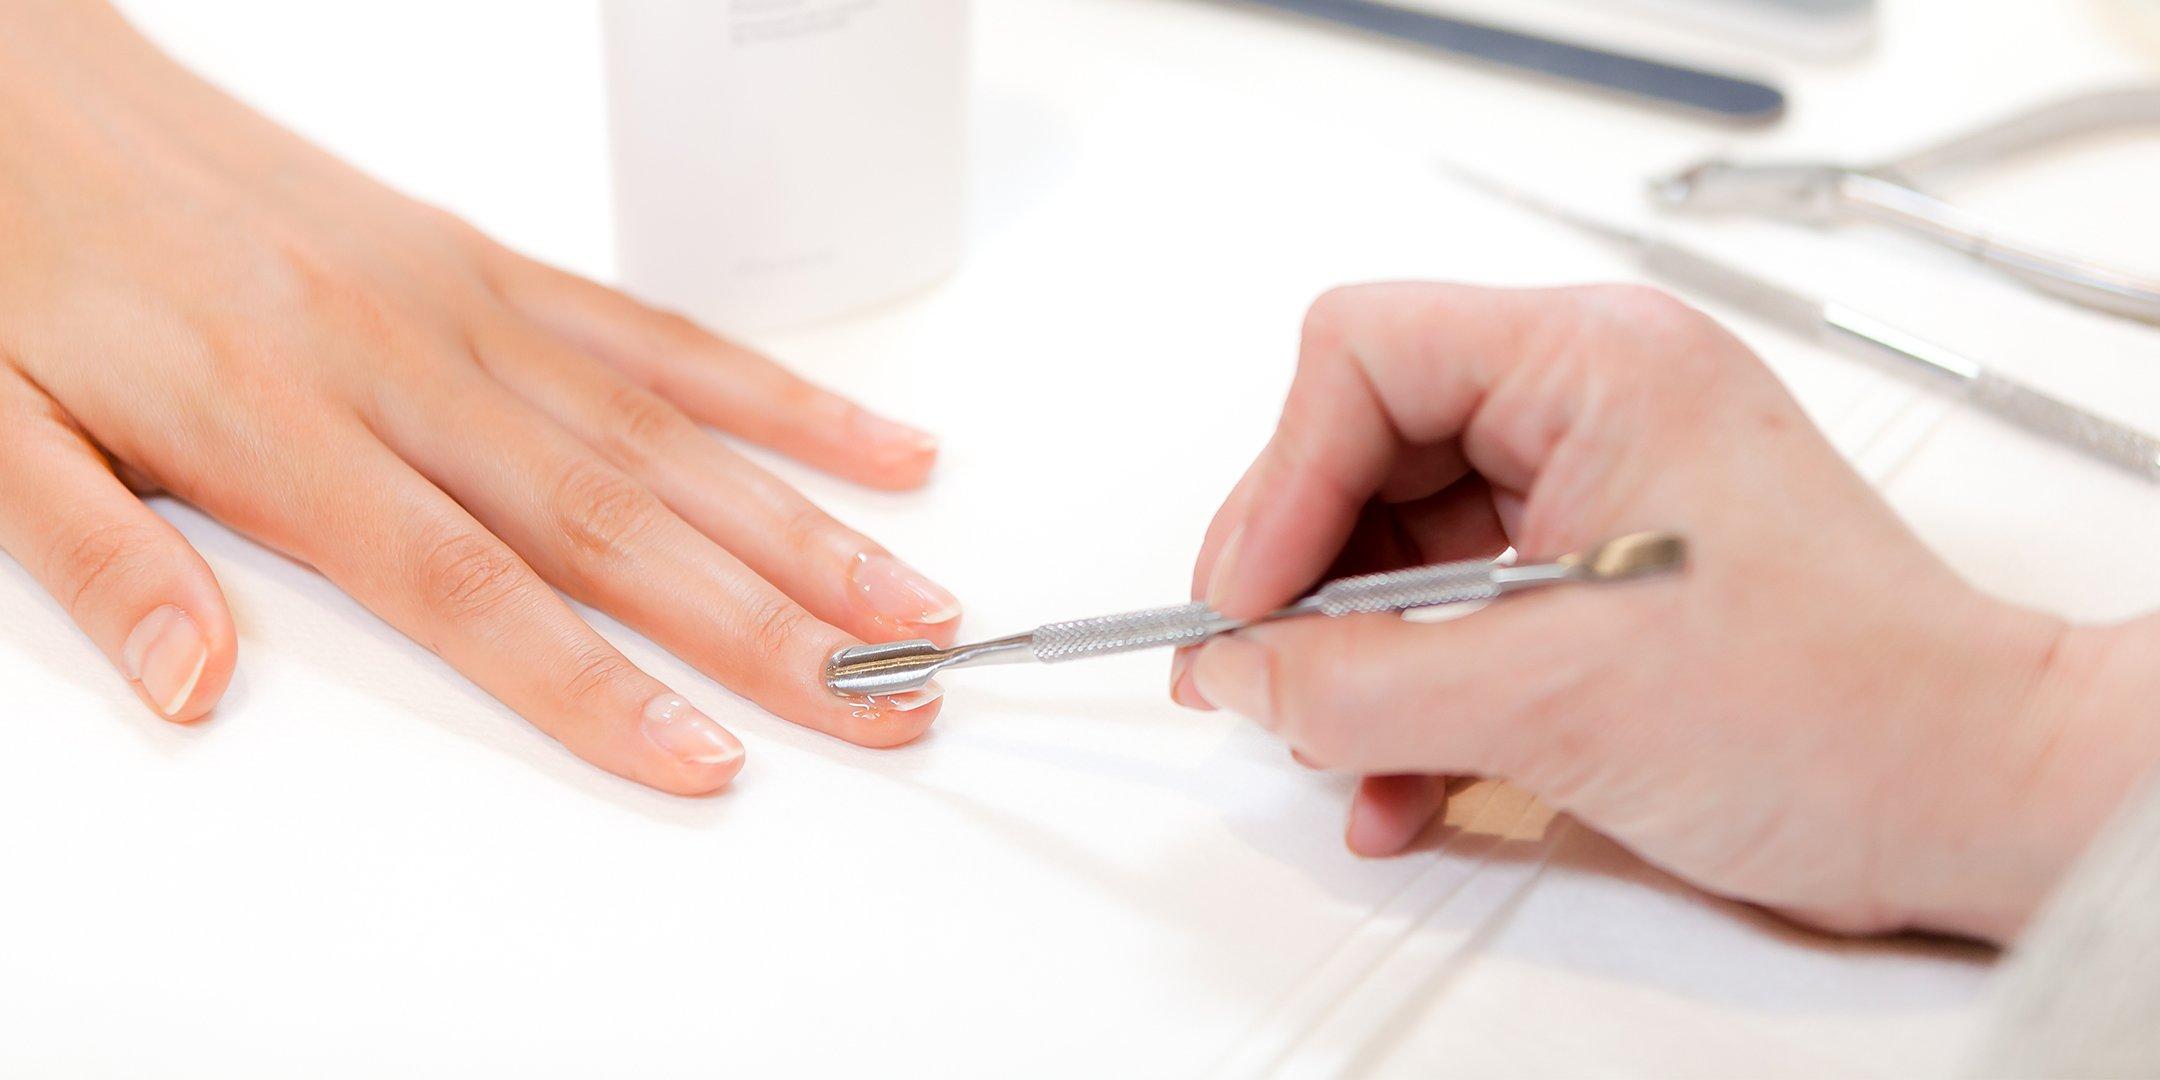 Nails_Quick-Manicure_Webinar_Online_Header_2160x1080